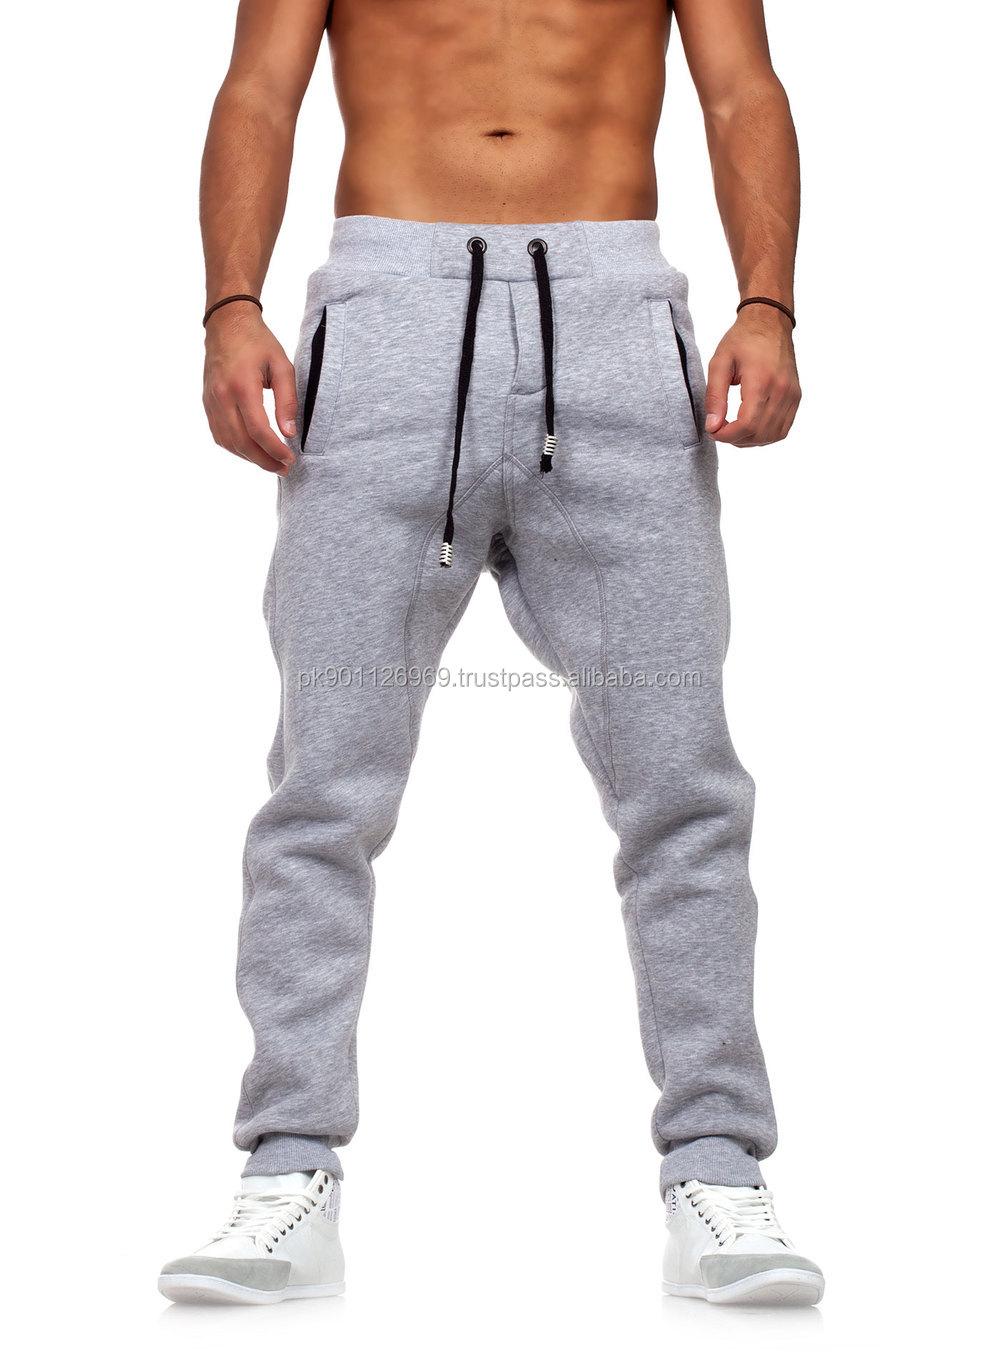 wholesale cotton sweatpant gym tights pant men buy. Black Bedroom Furniture Sets. Home Design Ideas